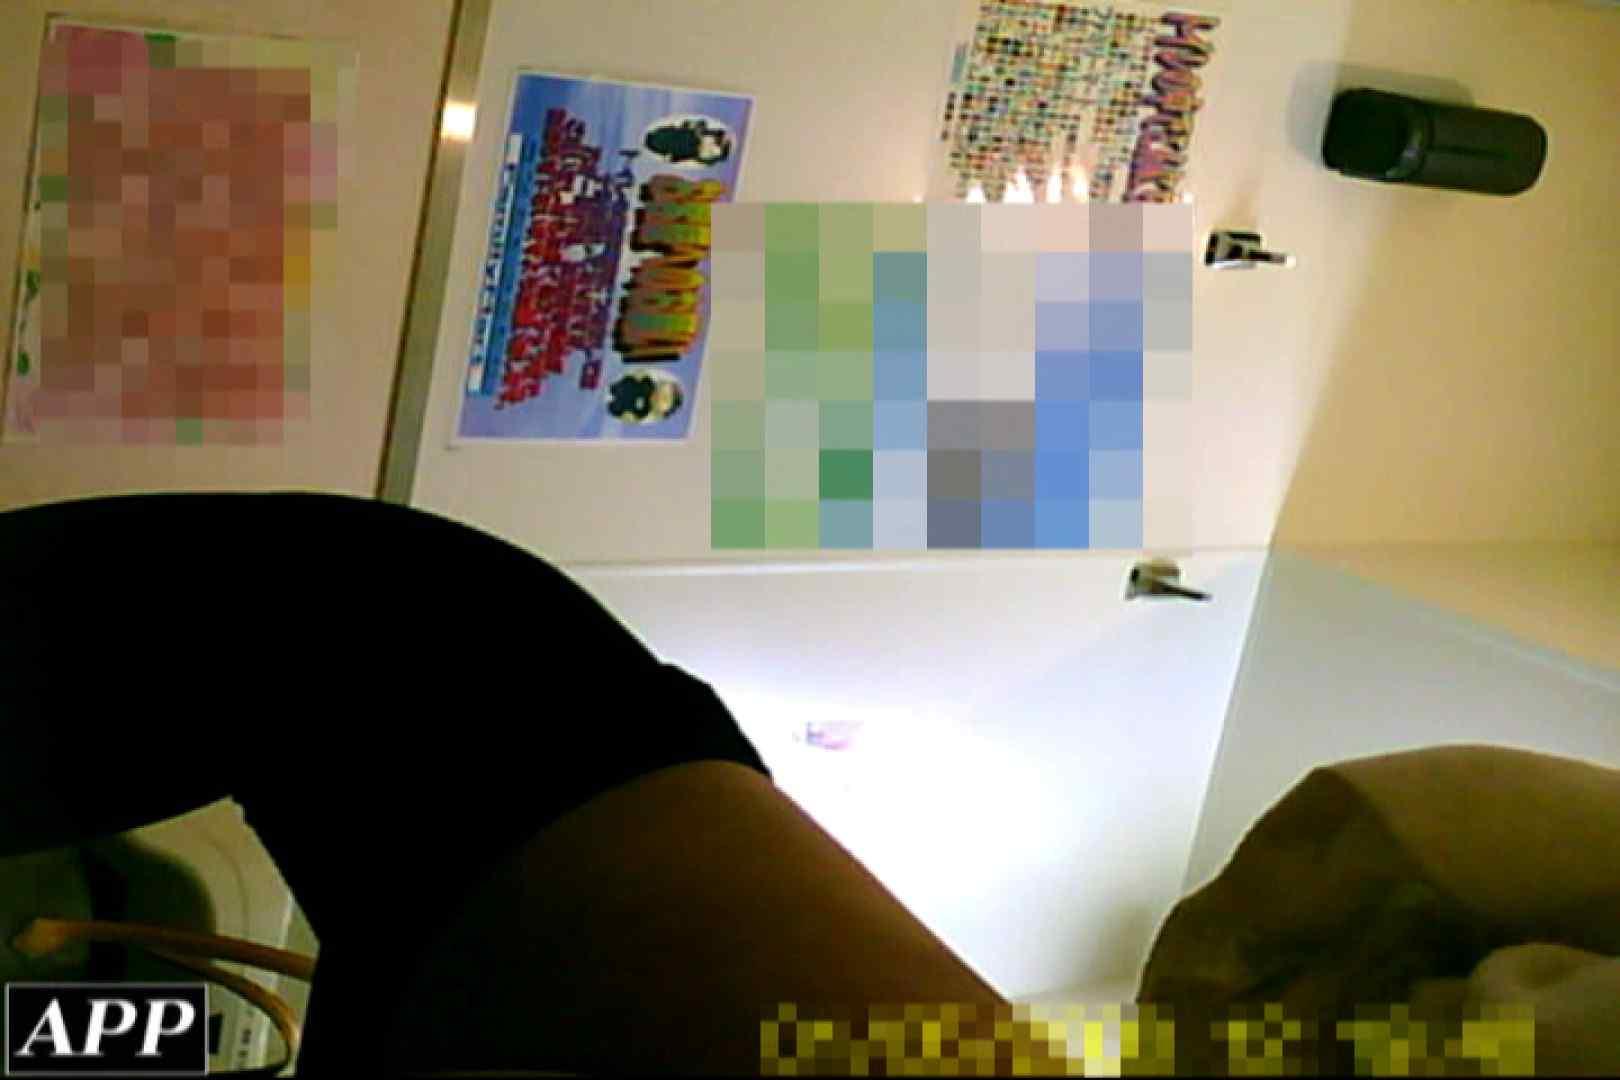 3視点洗面所 vol.037 洗面所 | OLセックス  49画像 17